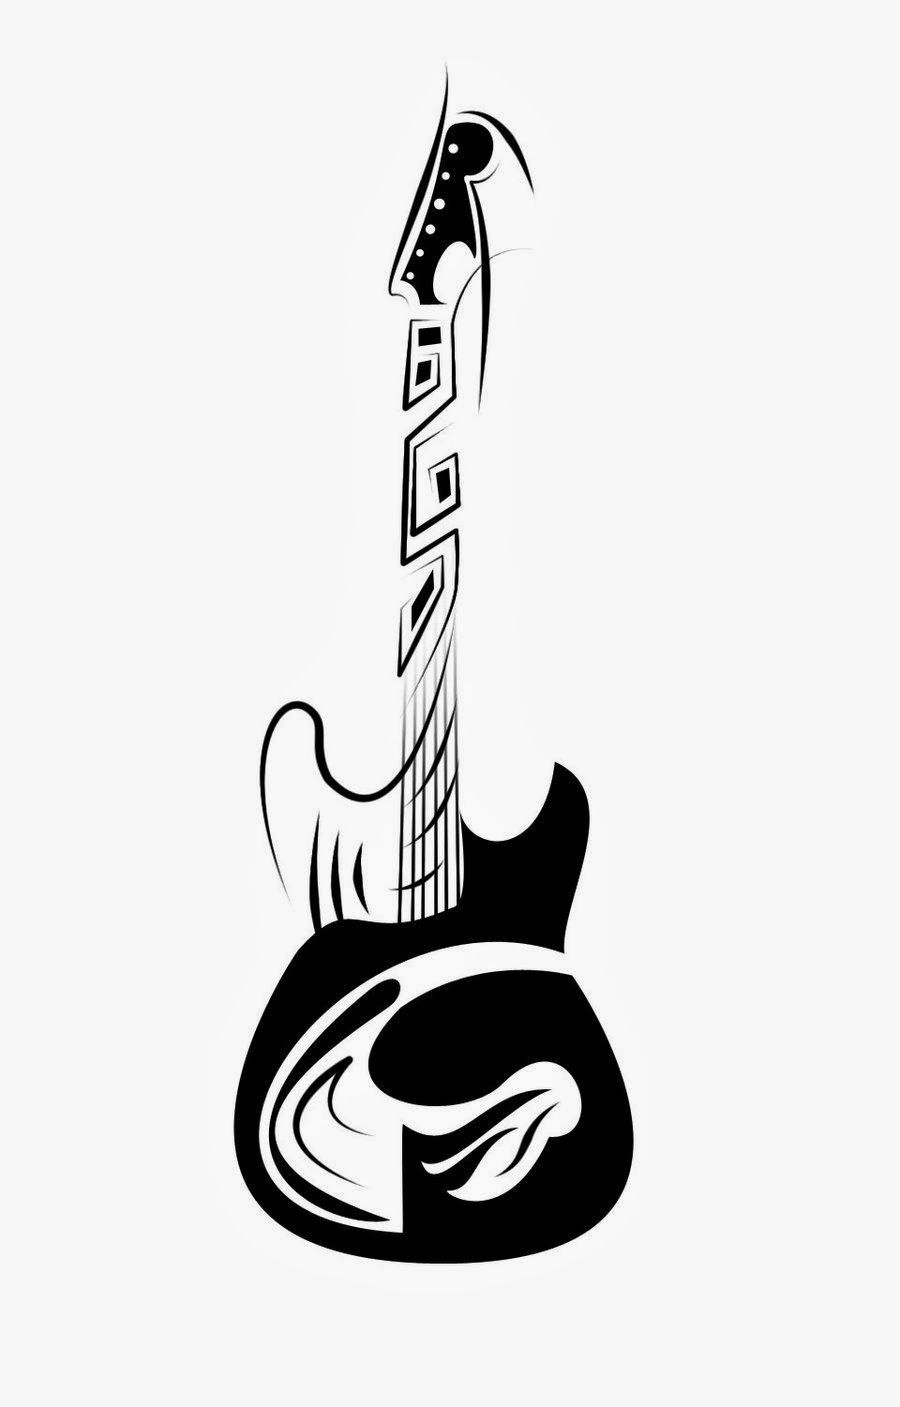 Tribal Guitar Tattoo Designs Guitar Tattoo Design Guitar Tattoo